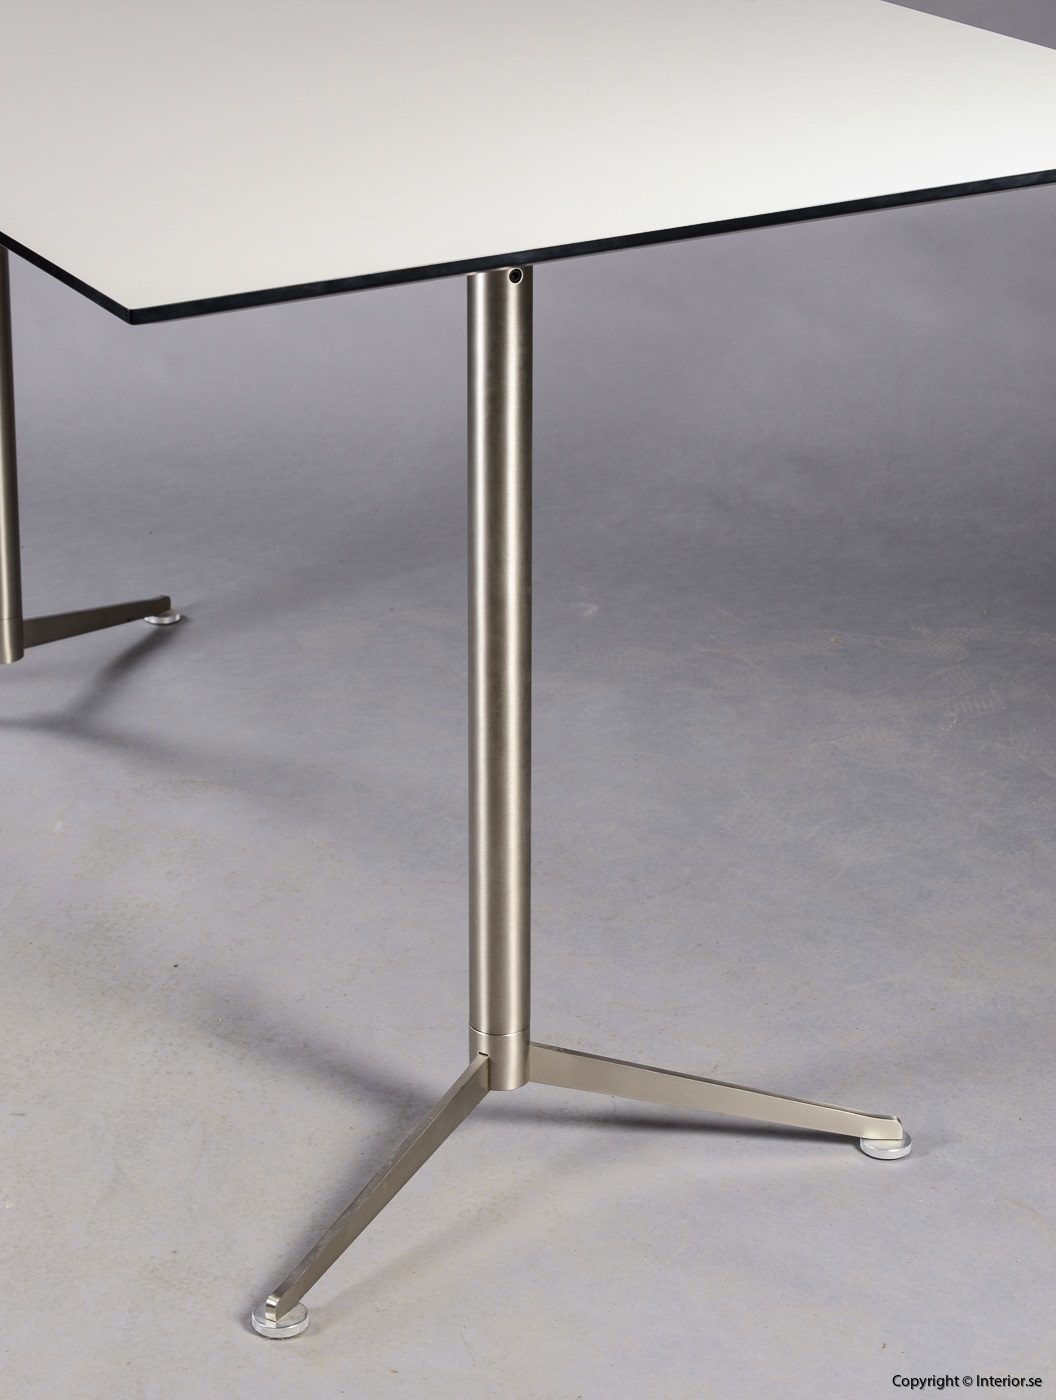 1 Bord Pausitan Spinal Table Paul Leroy begagnade kontorsmöbler designmöbler (2)